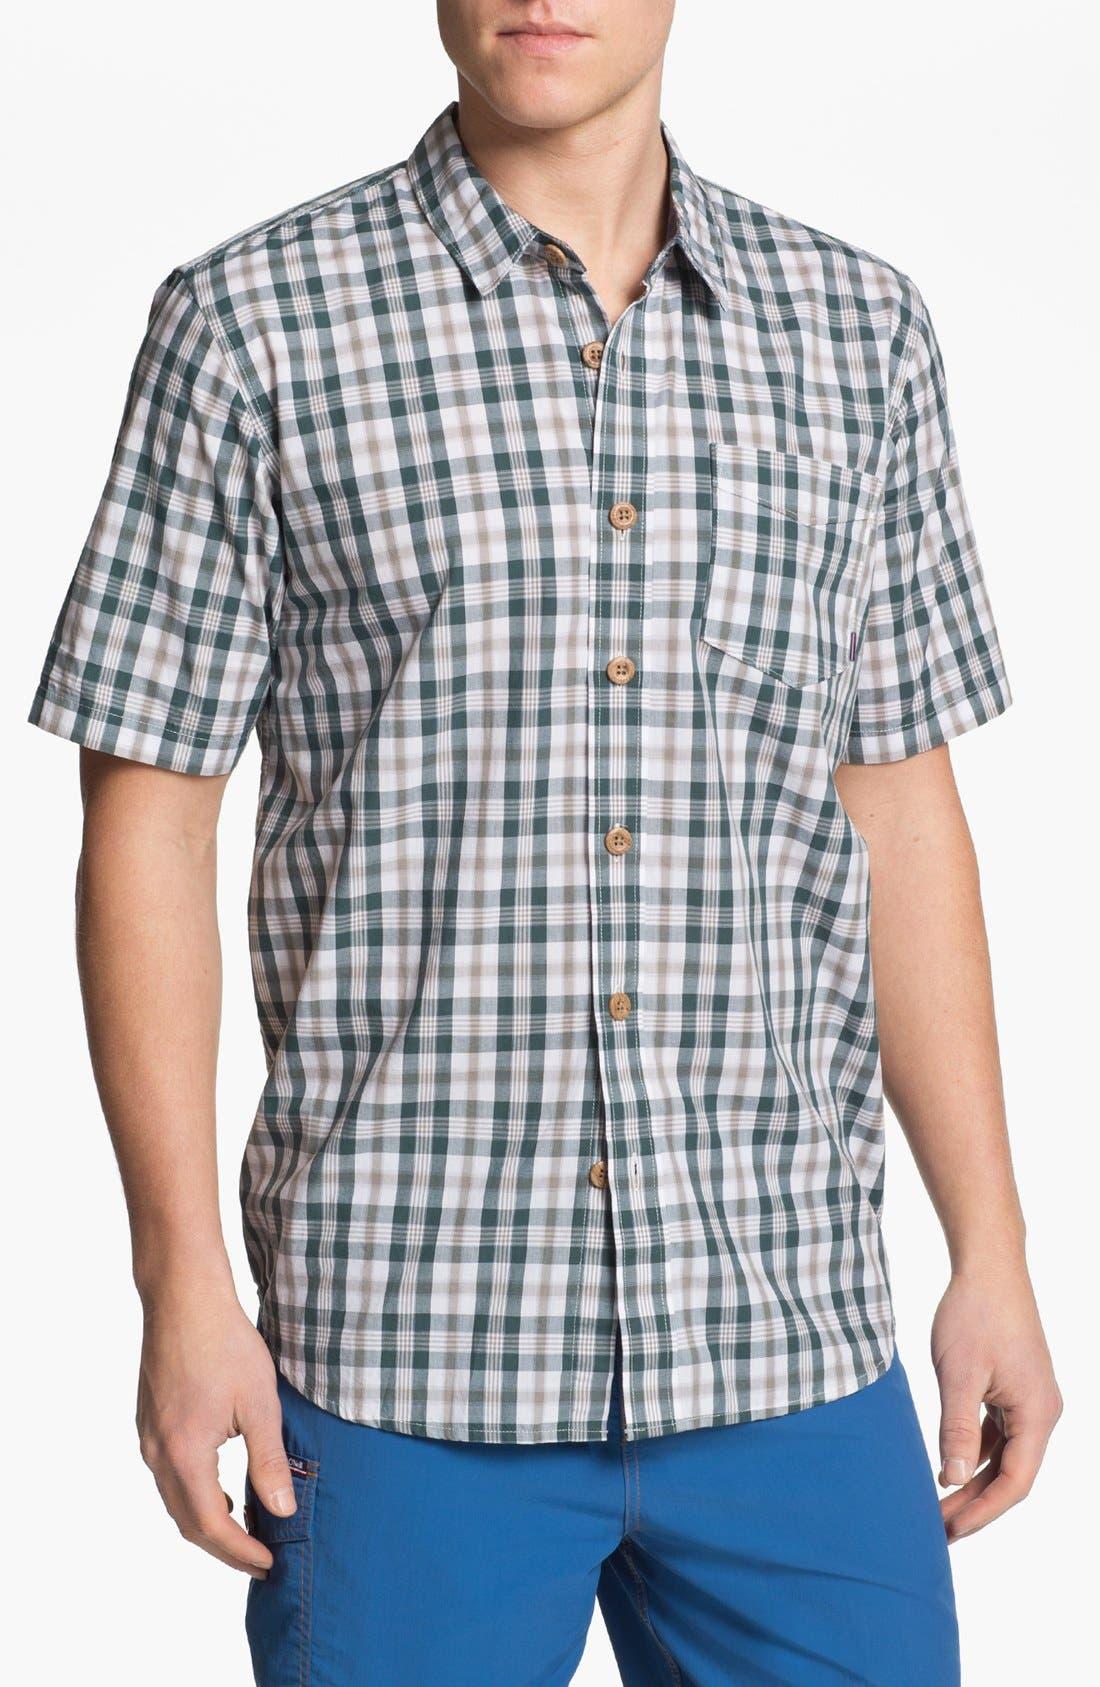 Alternate Image 1 Selected - Jack O'Neill 'Thurston' Regular Fit Short Sleeve Sport Shirt